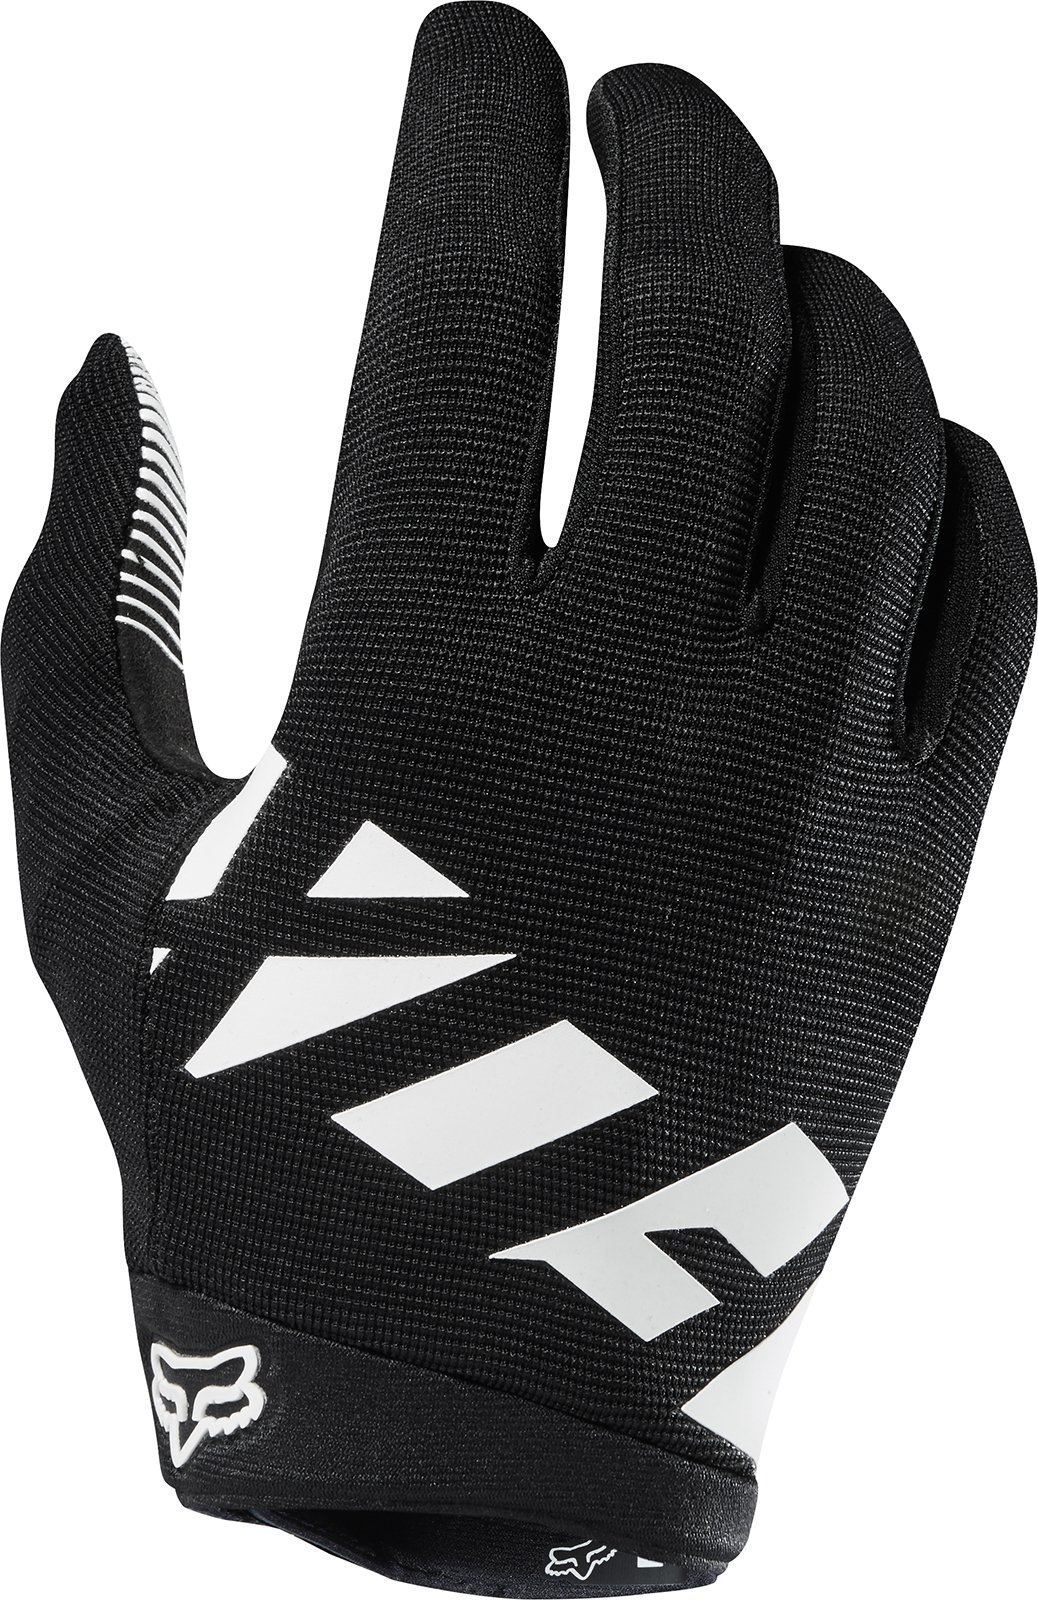 Fox Racing Ranger Glove - Men's Black/White, L by Fox Racing